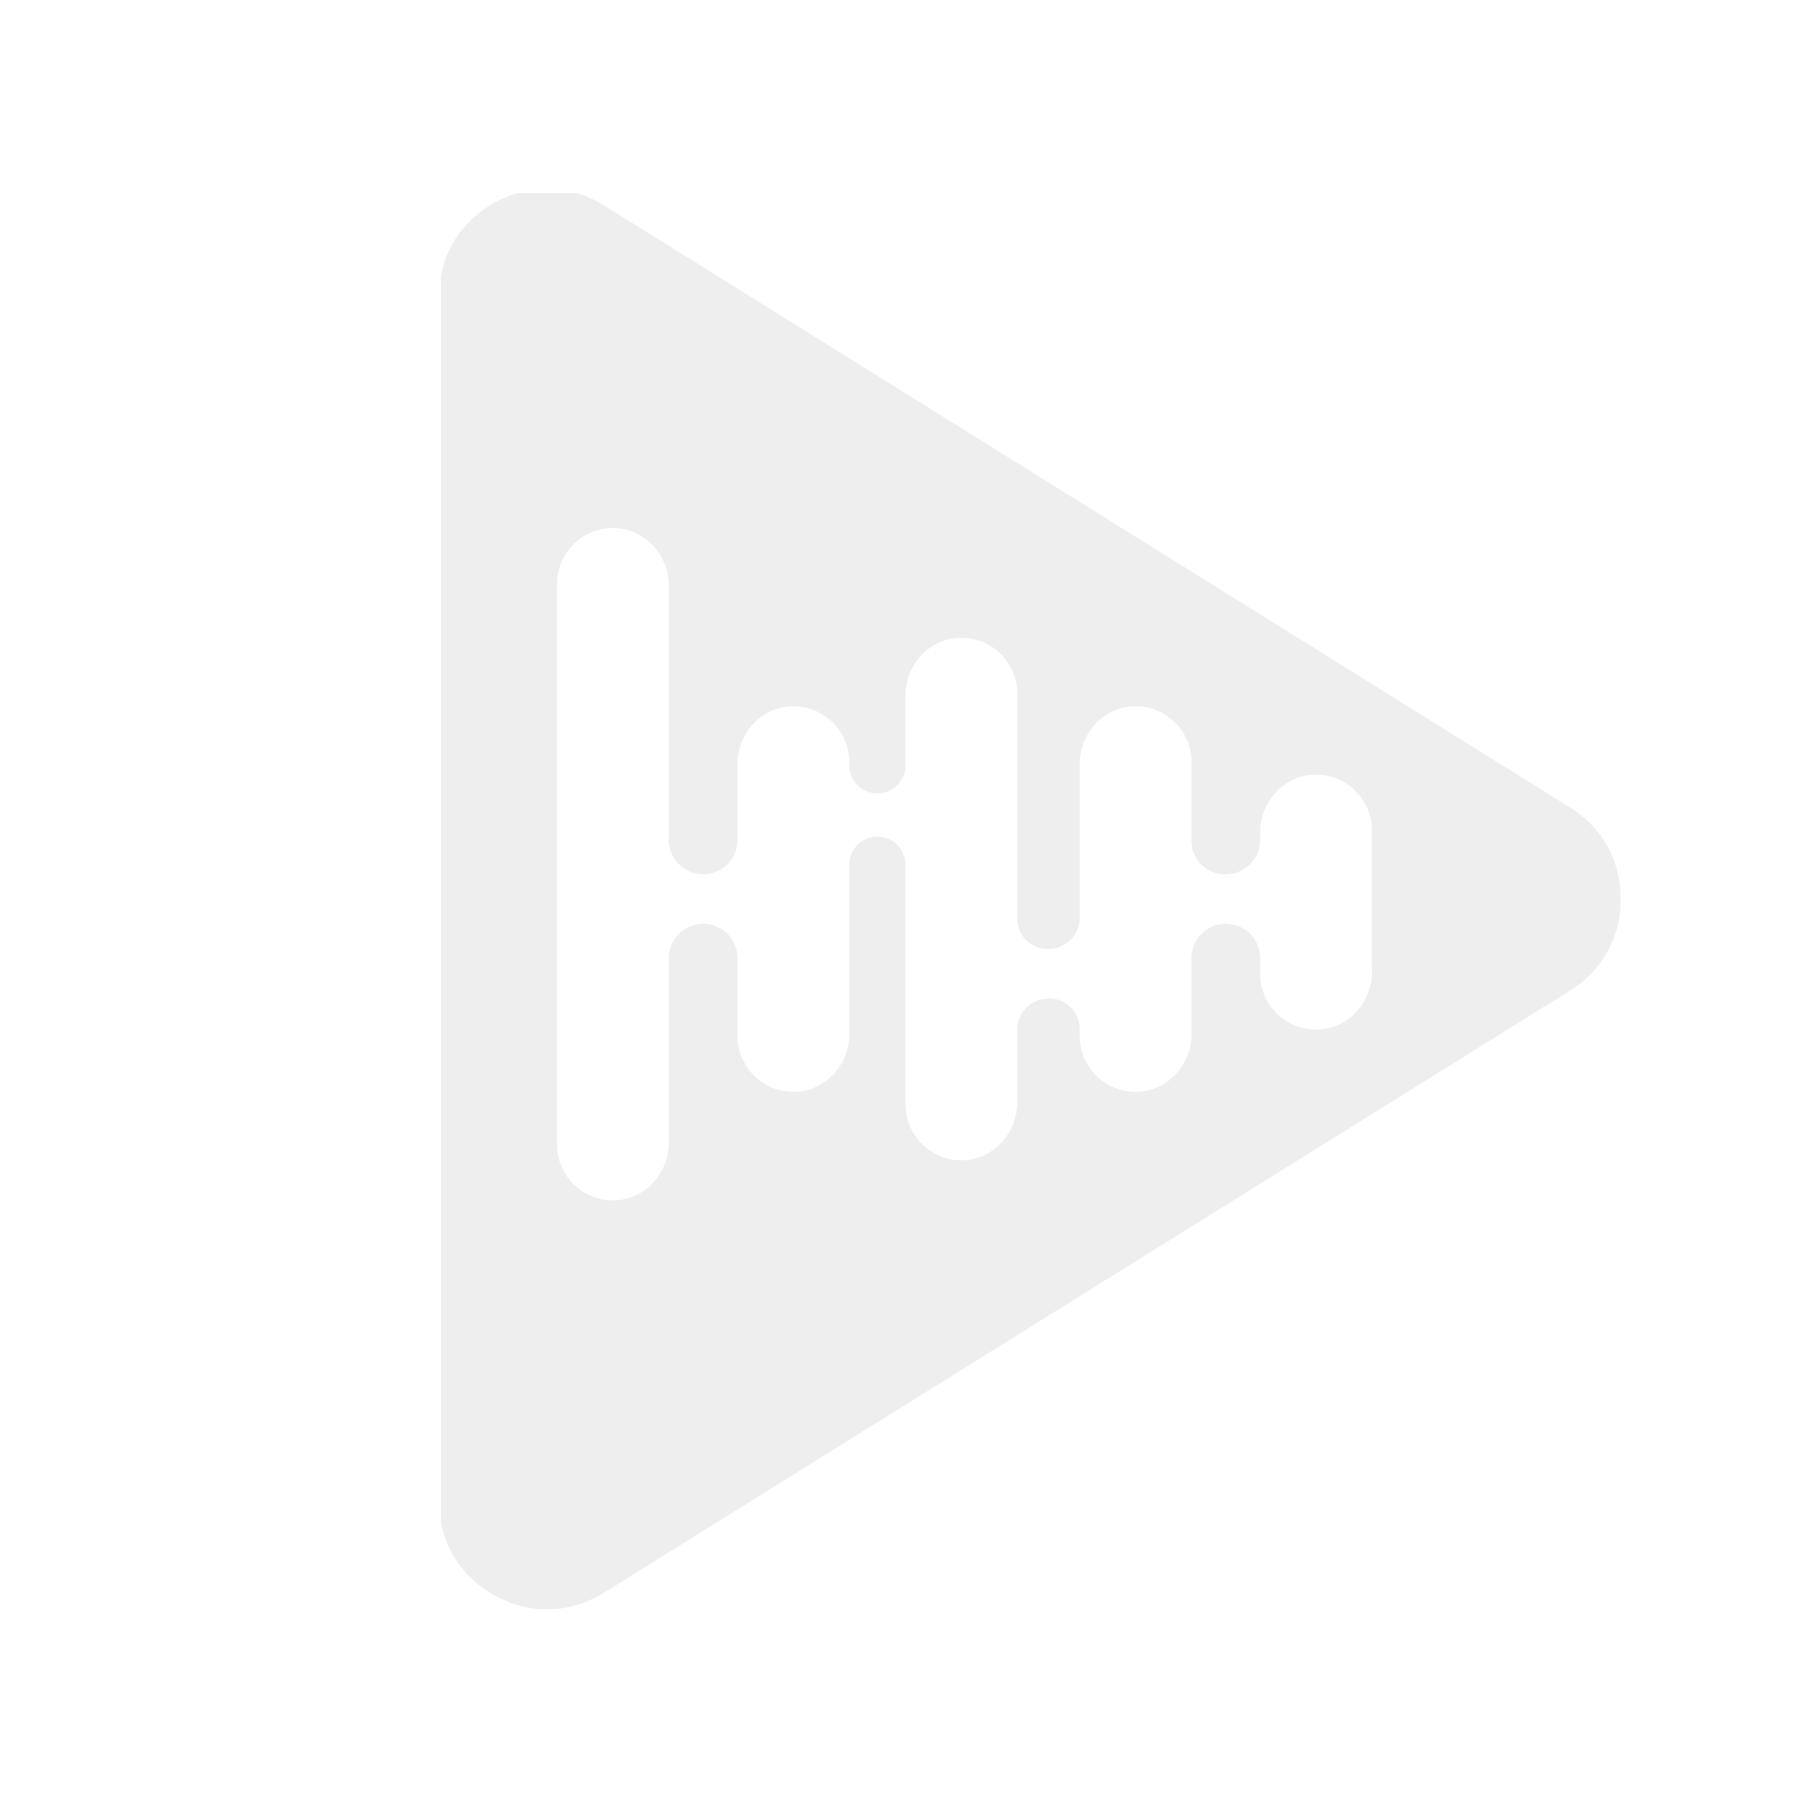 Phonocar VM275 - Biltilpasset ryggekamera